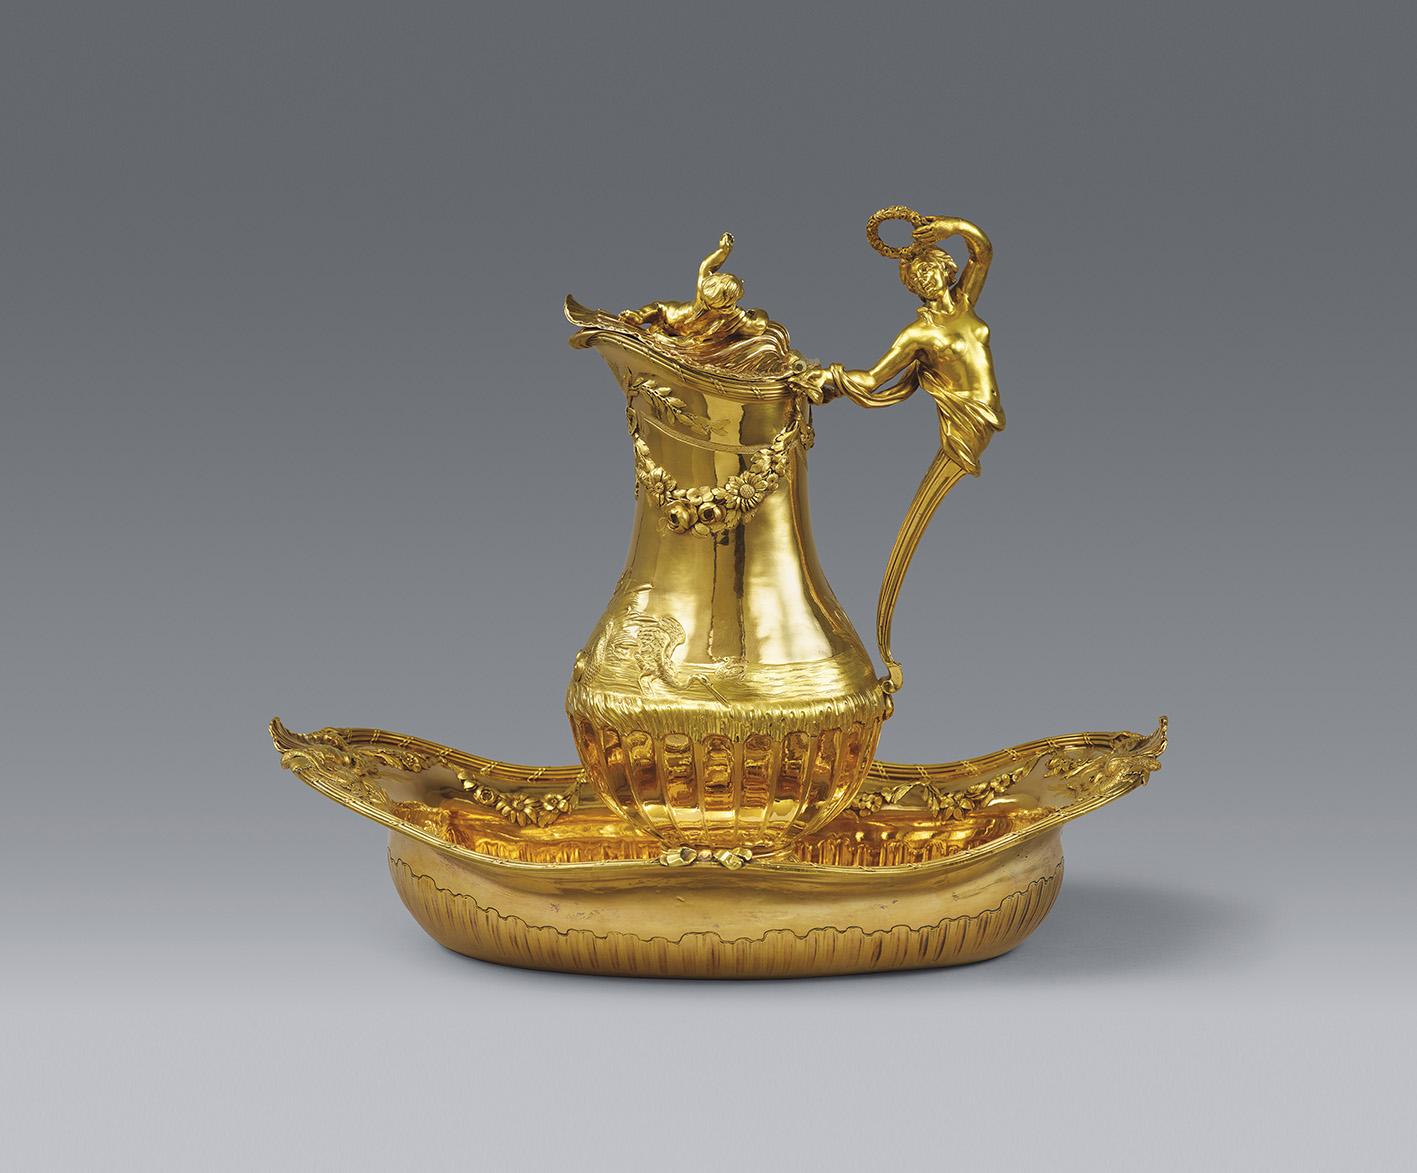 Jean-Baptiste François Chéret, Paris, 1770. Toiletry set for the Marquis and Marquise de Montmelas, silver with two-toned gold plating, h. of pitcher 29.5 cm/11.6 in, h. of basin 9 cm/3.5 in, l. 36.3 cm/14.3 in, d. 23.5 cm/9.3 in. Total weight 2,479 g/87.44 oz. Estimate: €1/1.2 M